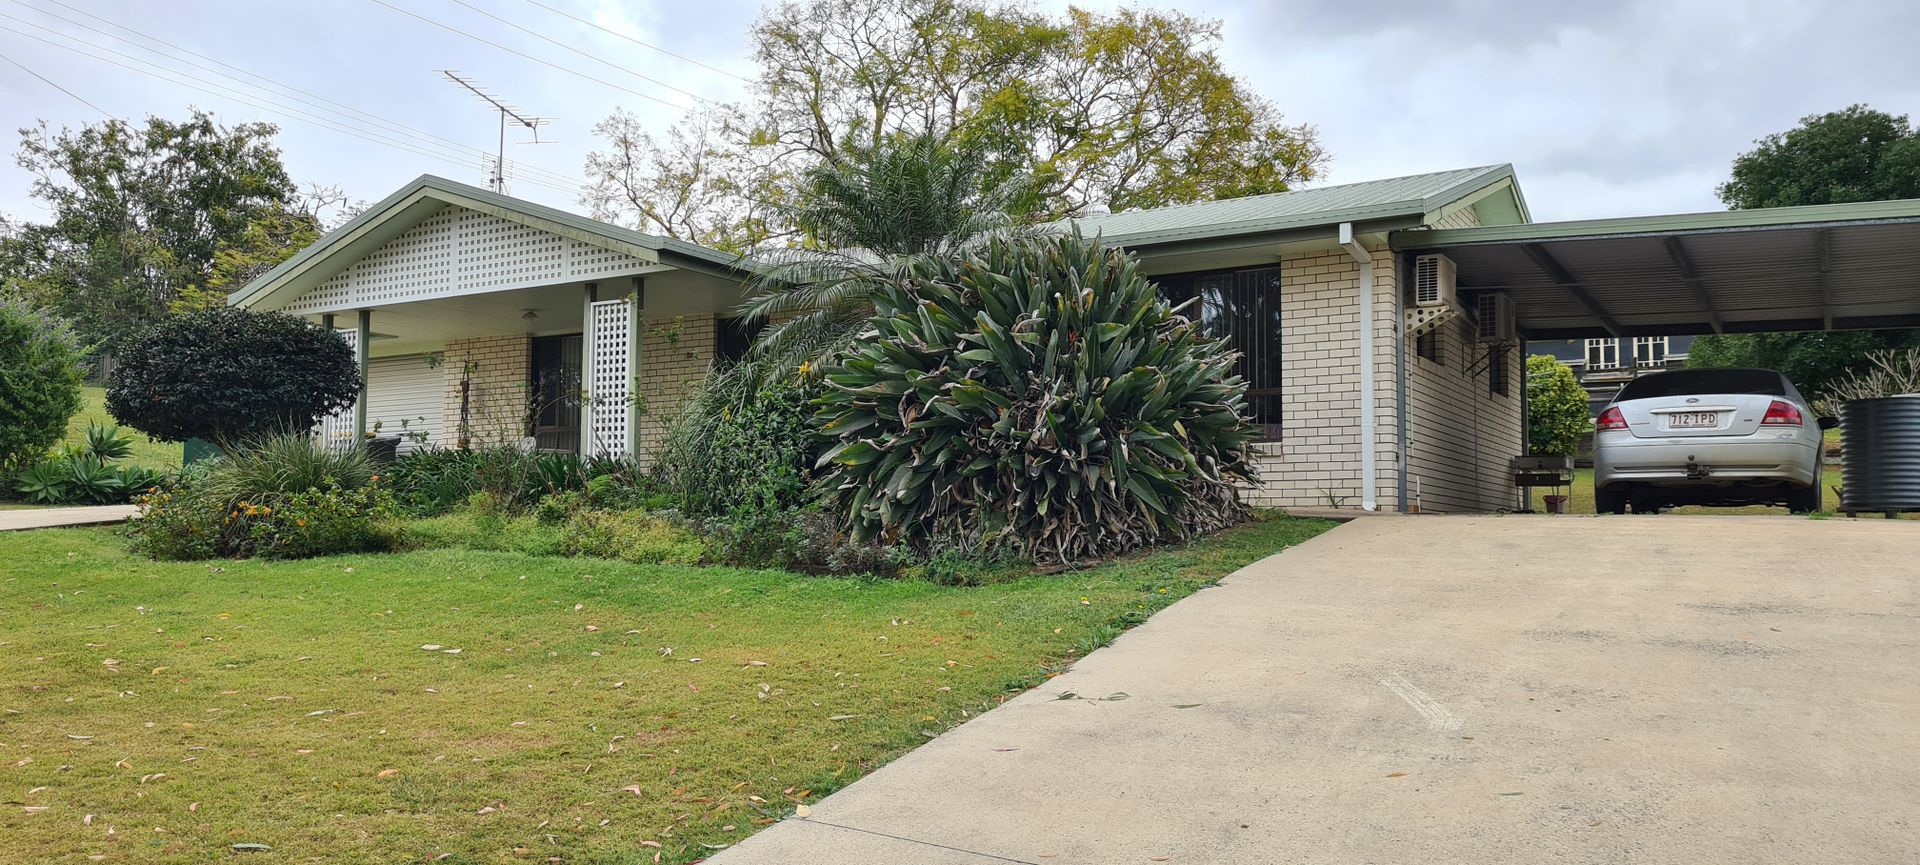 84 Taylor Street, Kilcoy QLD 4515, Image 1